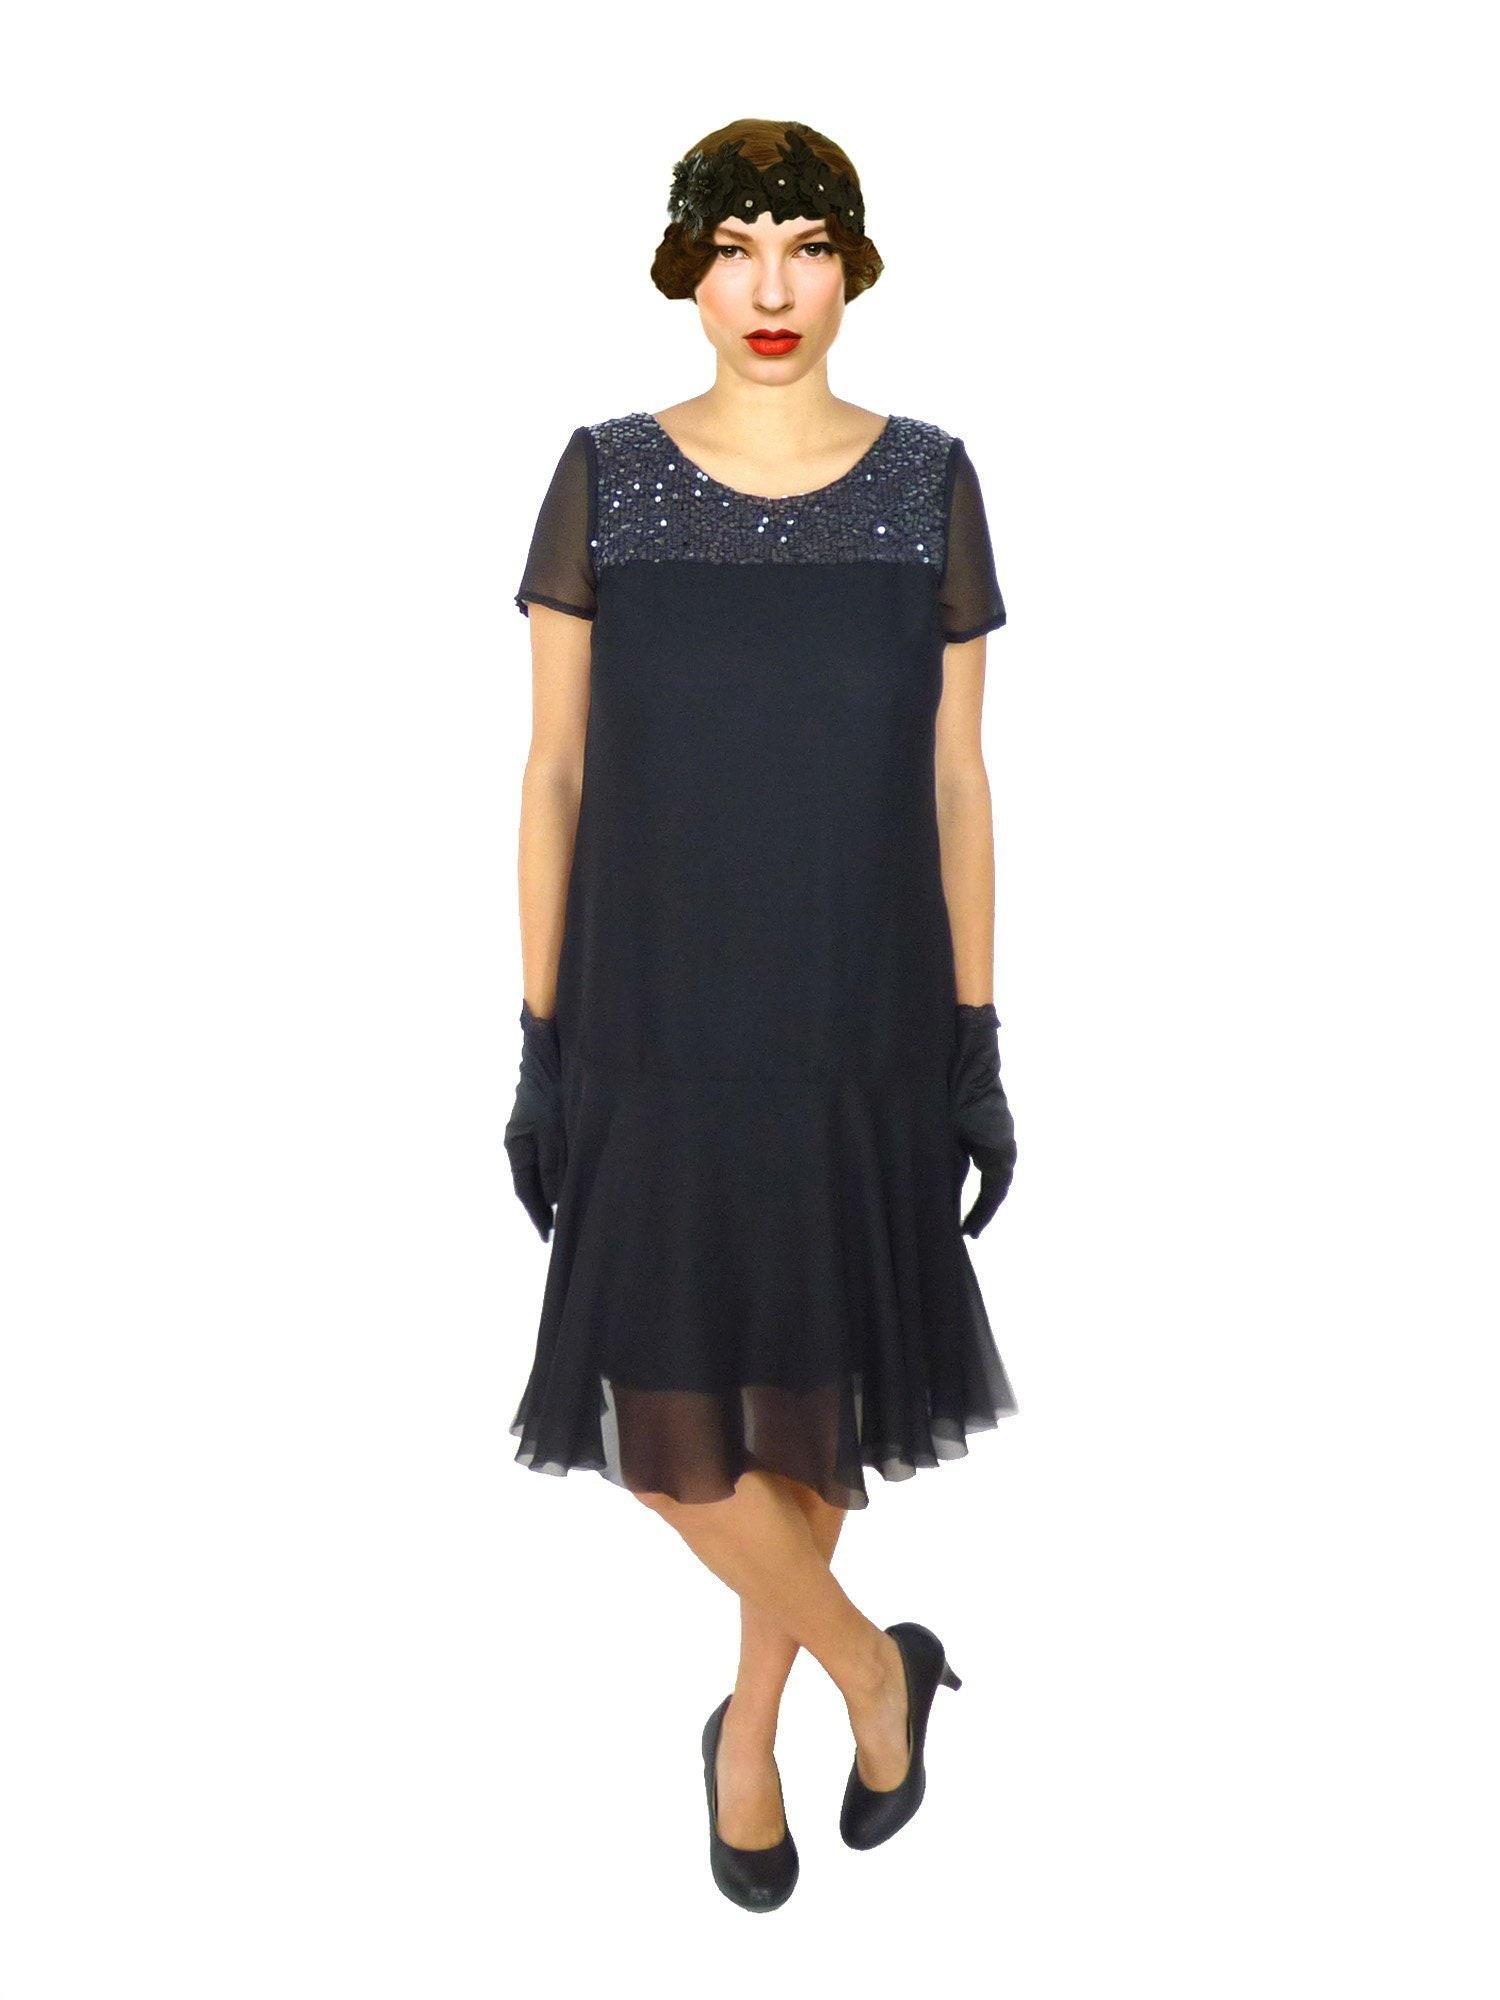 1920s Black Sequin Dress, Flapper Dress, Roaring 20s, Miss Fisher, Sheath,  Downton Abbe, Great Gatsby, Party, Plus Size , Short Sleeve Dress